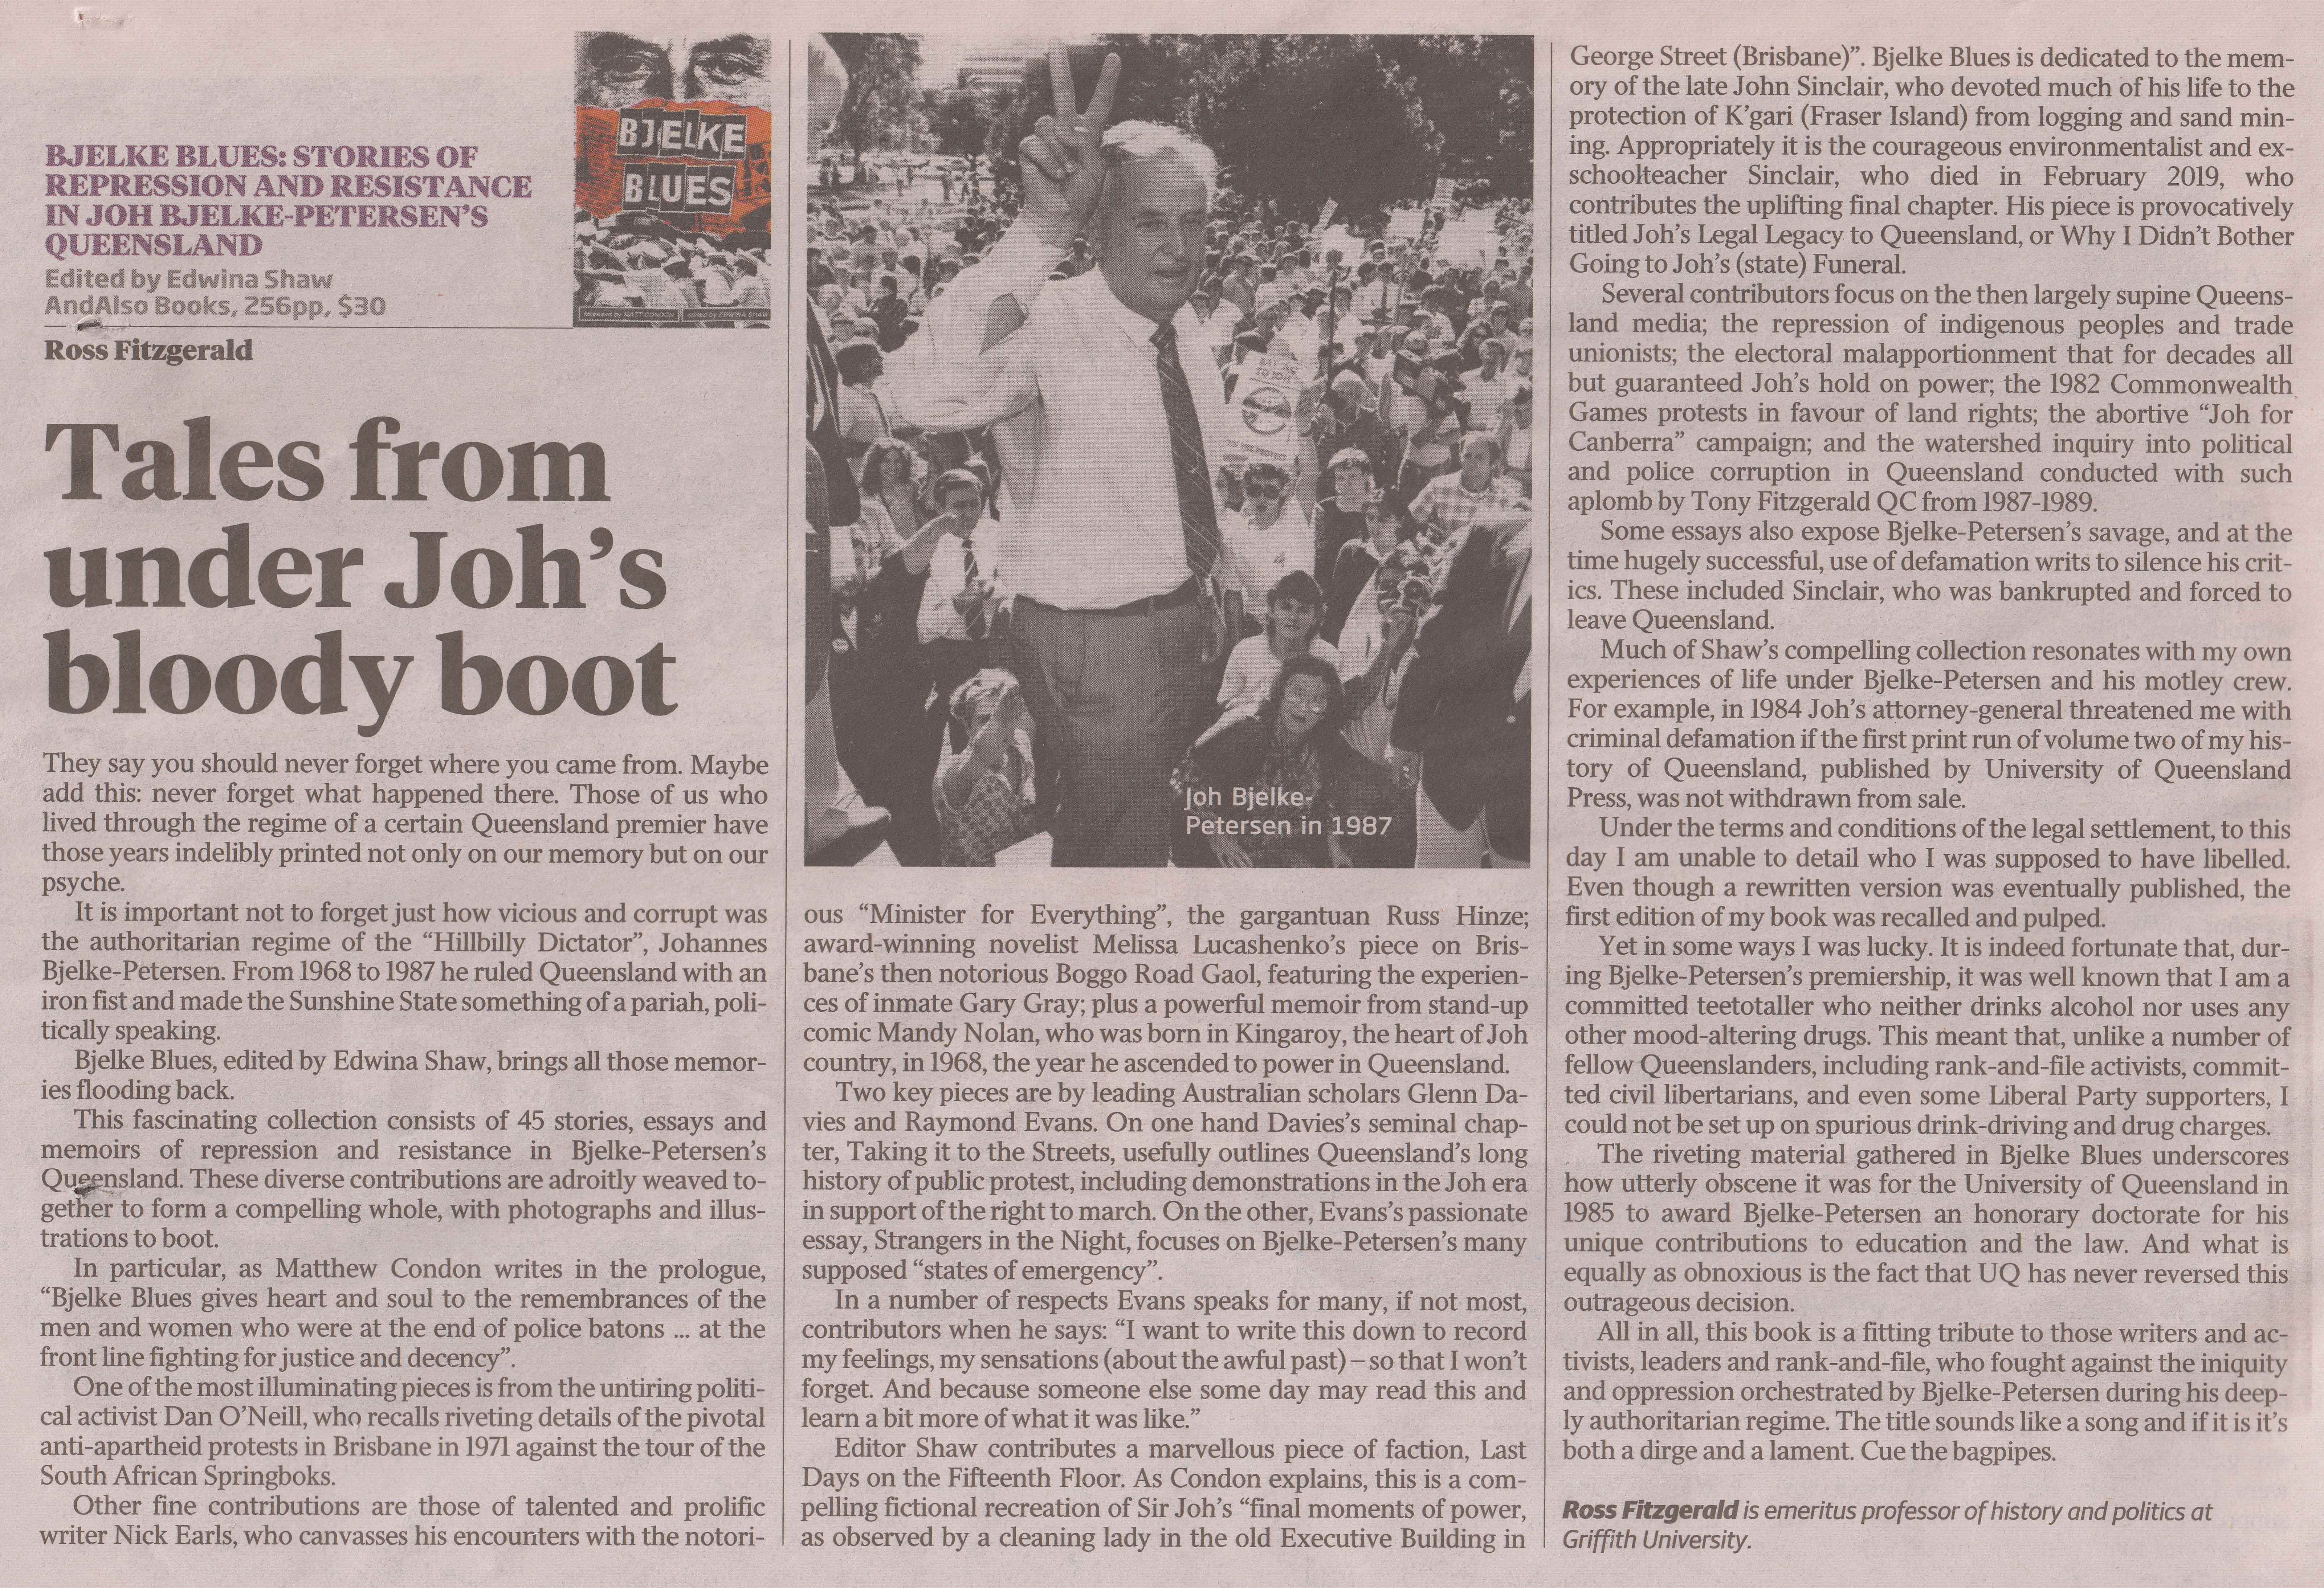 Bjelke Blues review, Fitzgerald, Weekend Aust 9-11-19 (lo res)